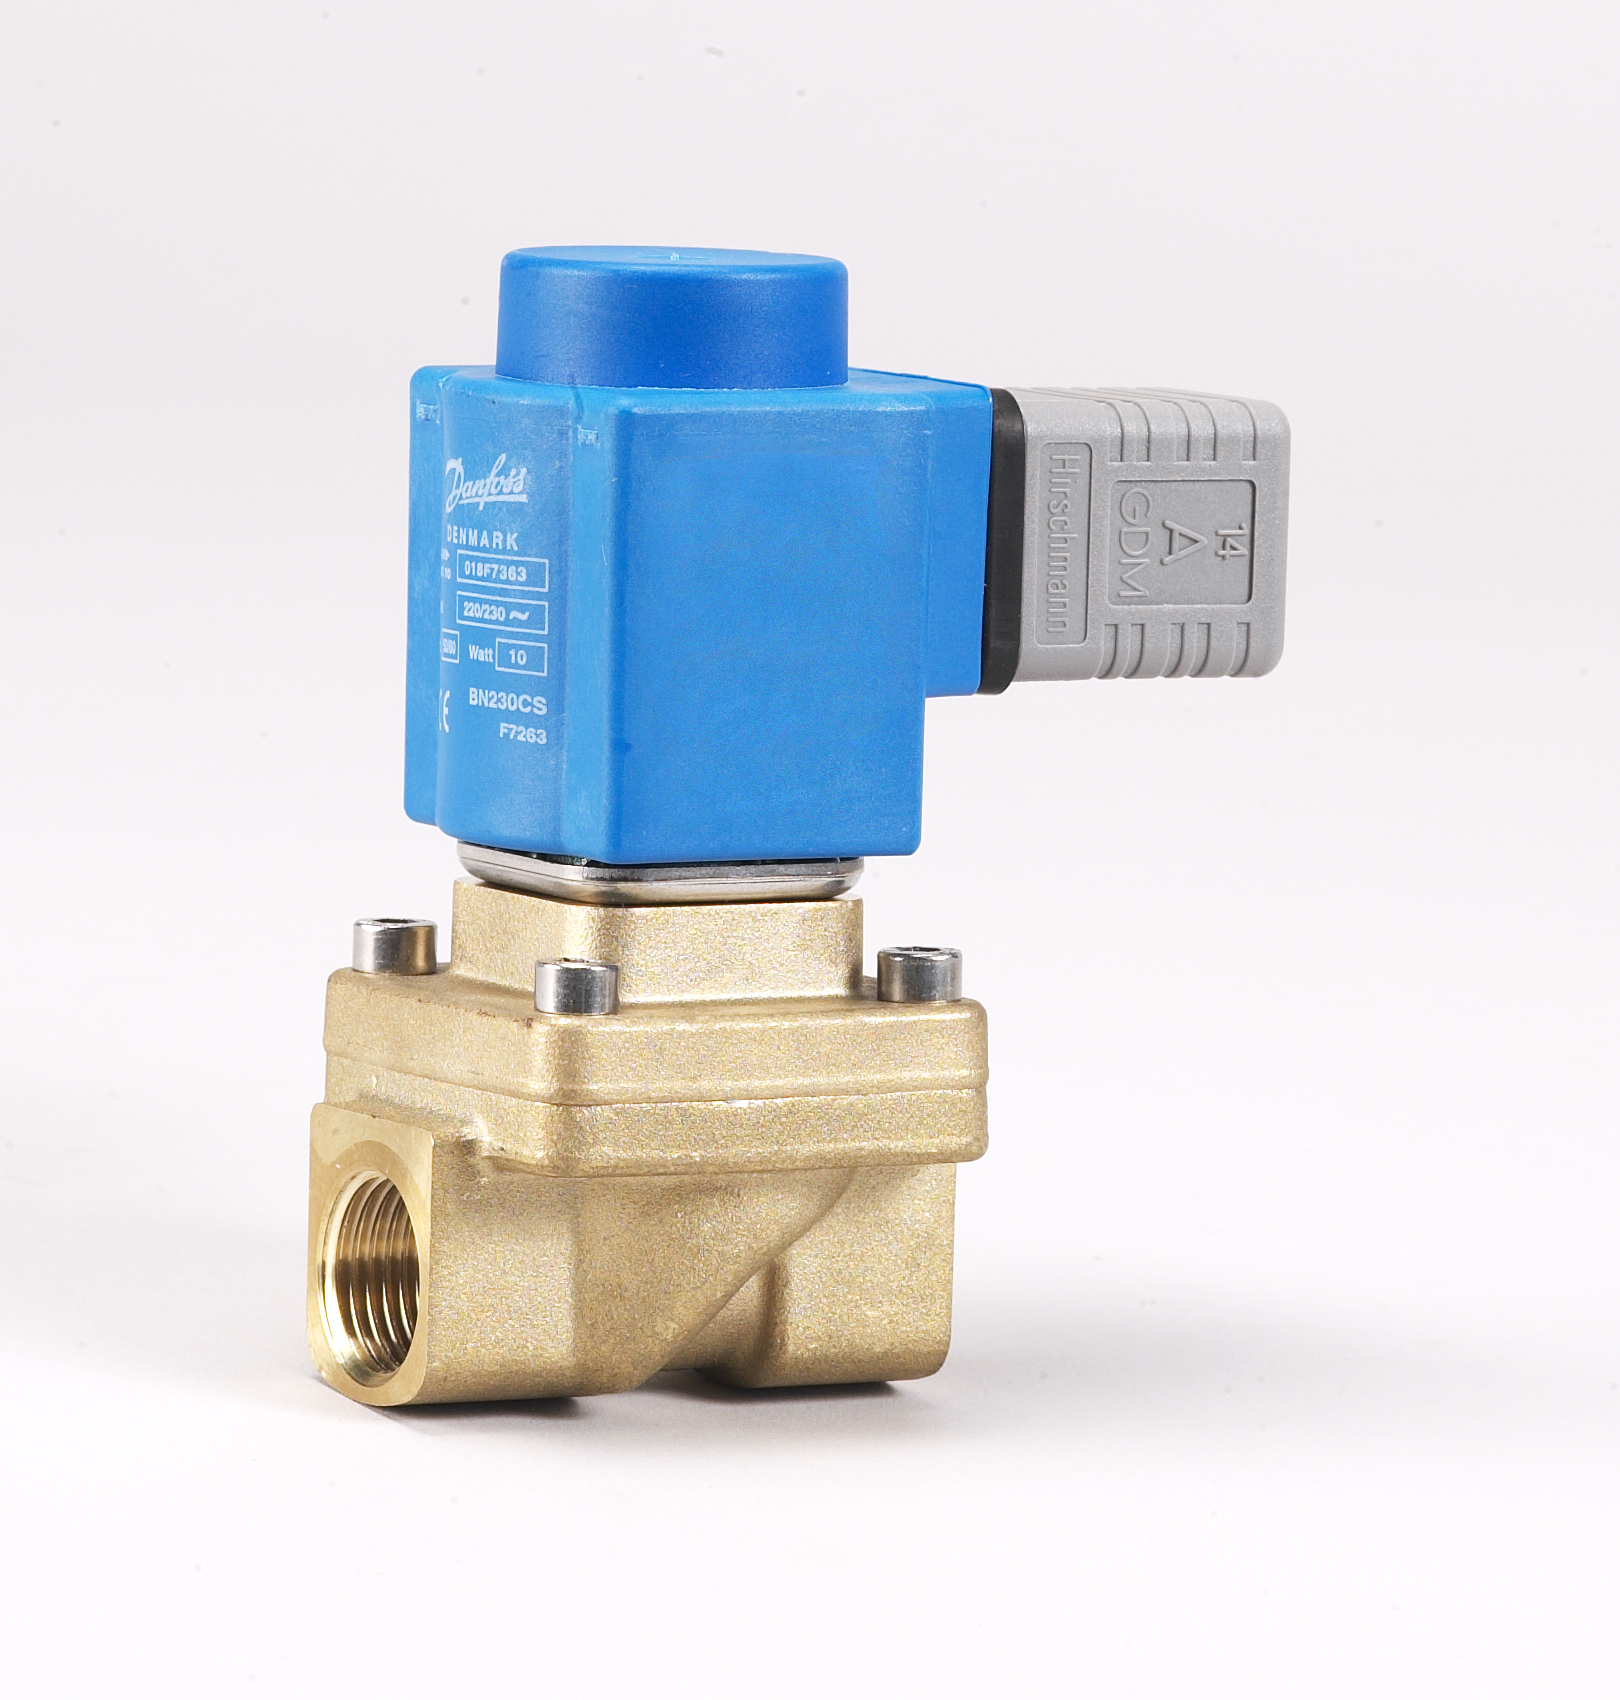 Solenoid valve, EV250B | Solenoid Valves | Valves | Industrial